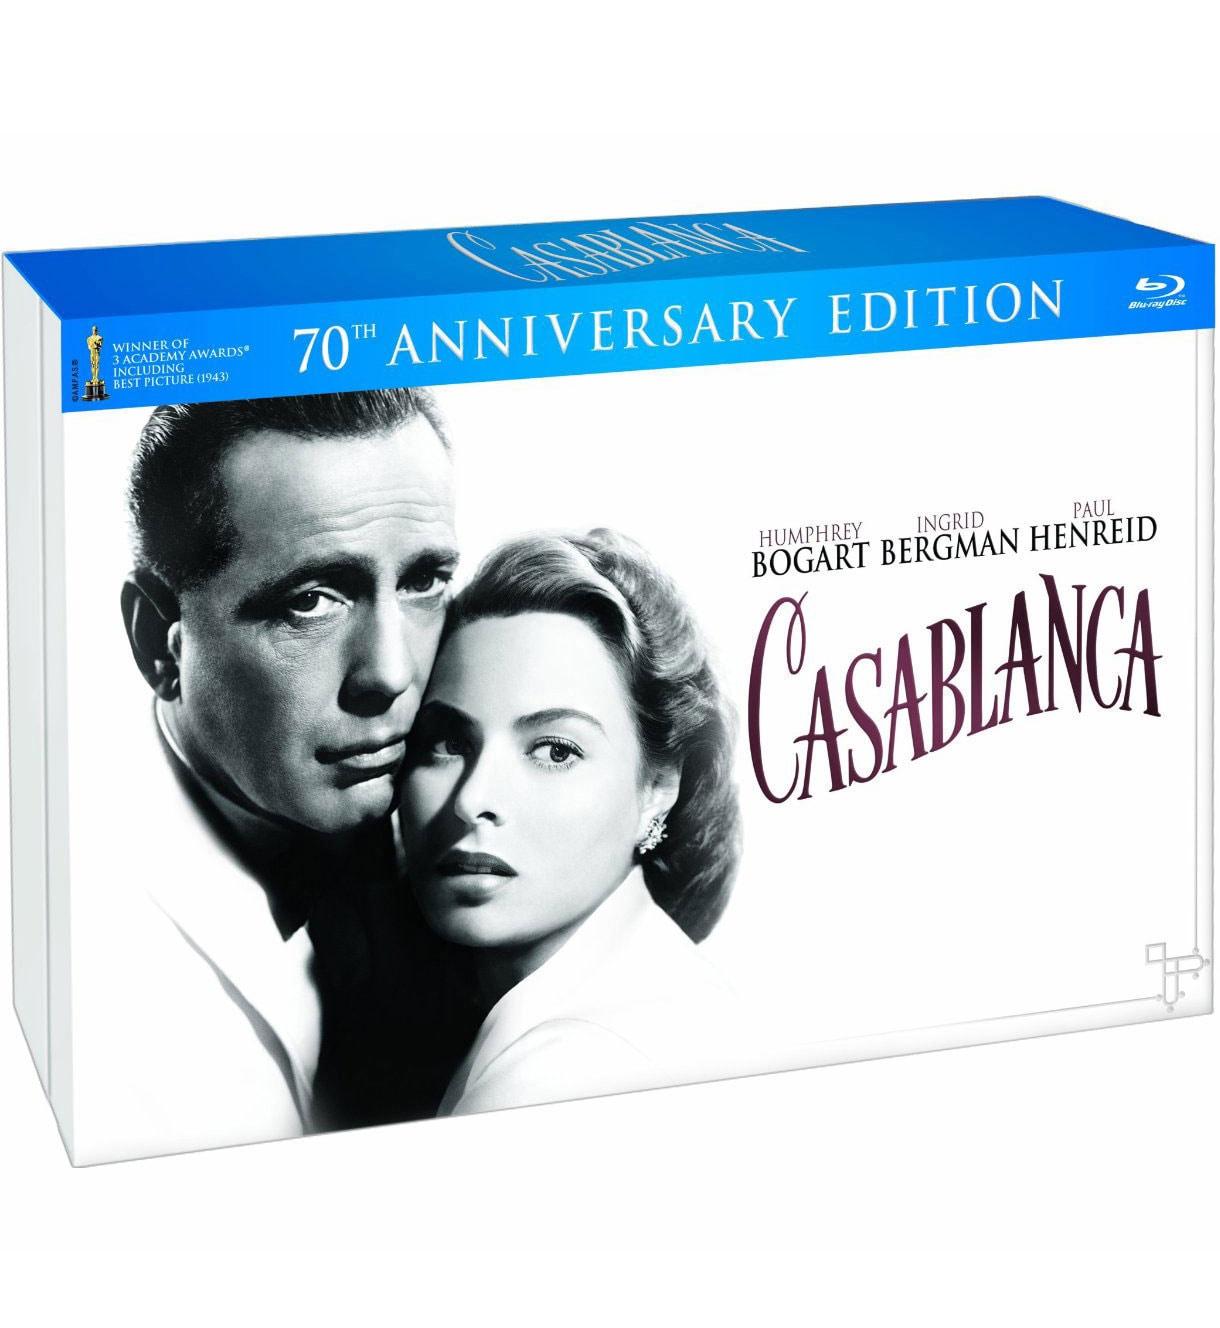 Casablanca 70th Anniversary Edition (Blu-ray/DVD)